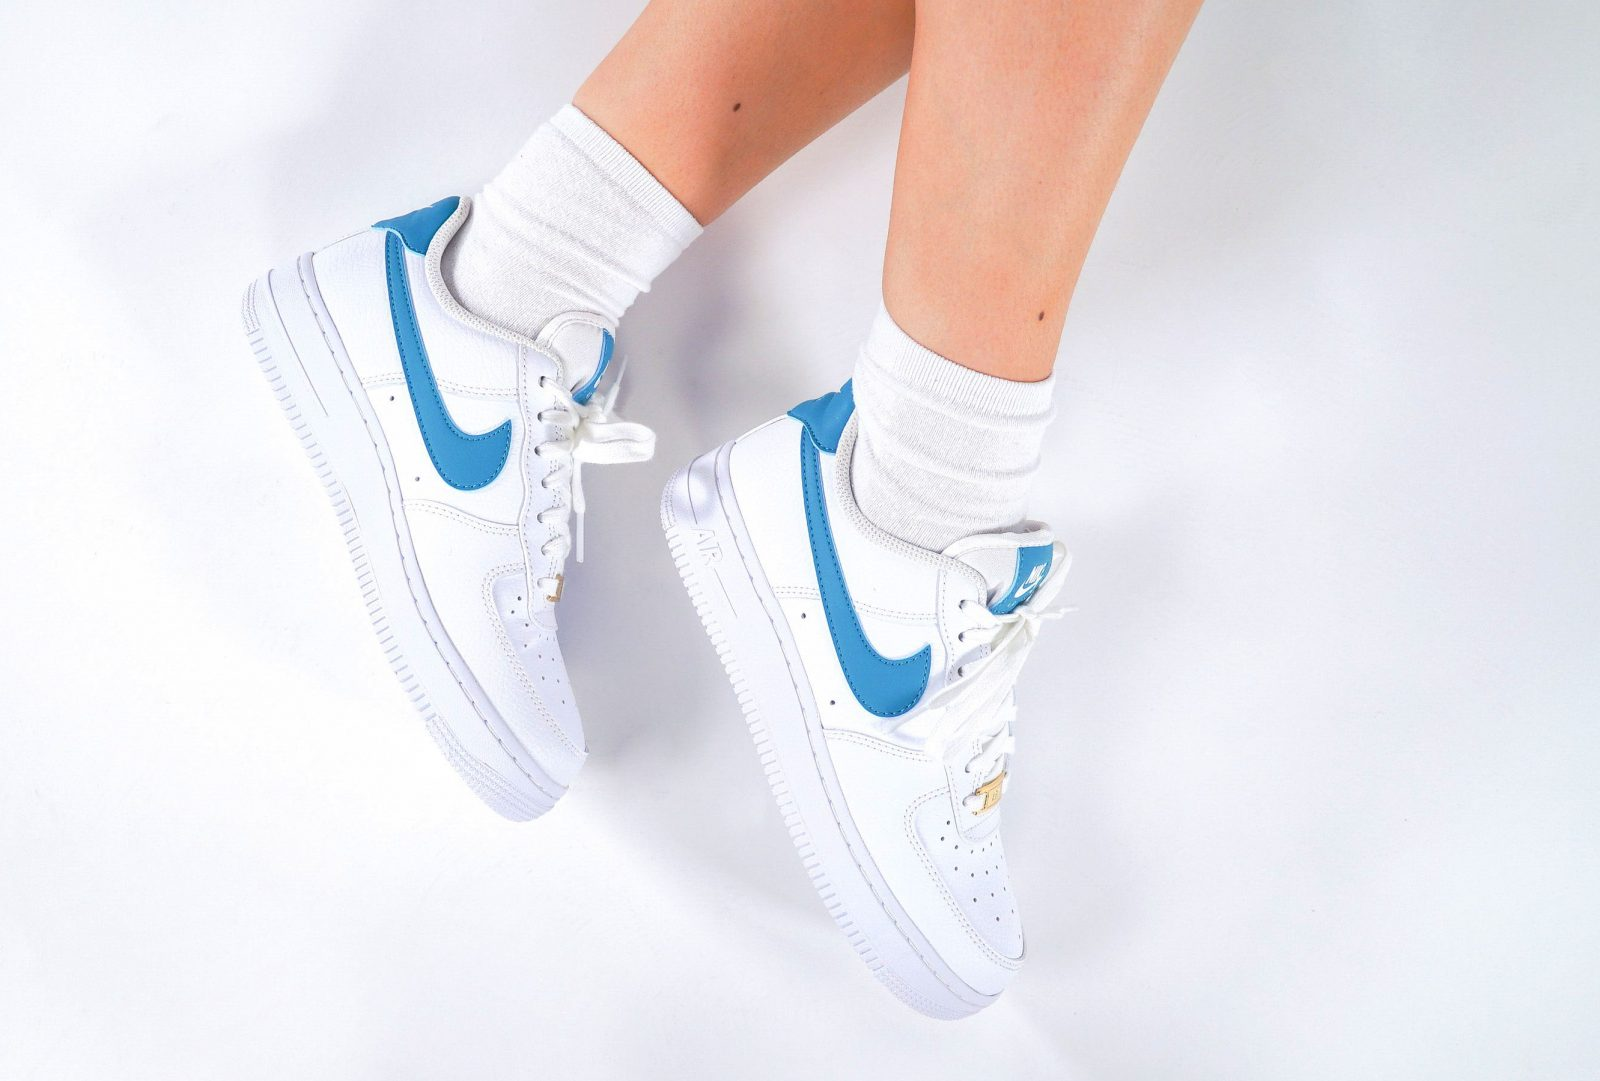 Nike Air Force 1 Teal Nebula The Sole Womens side